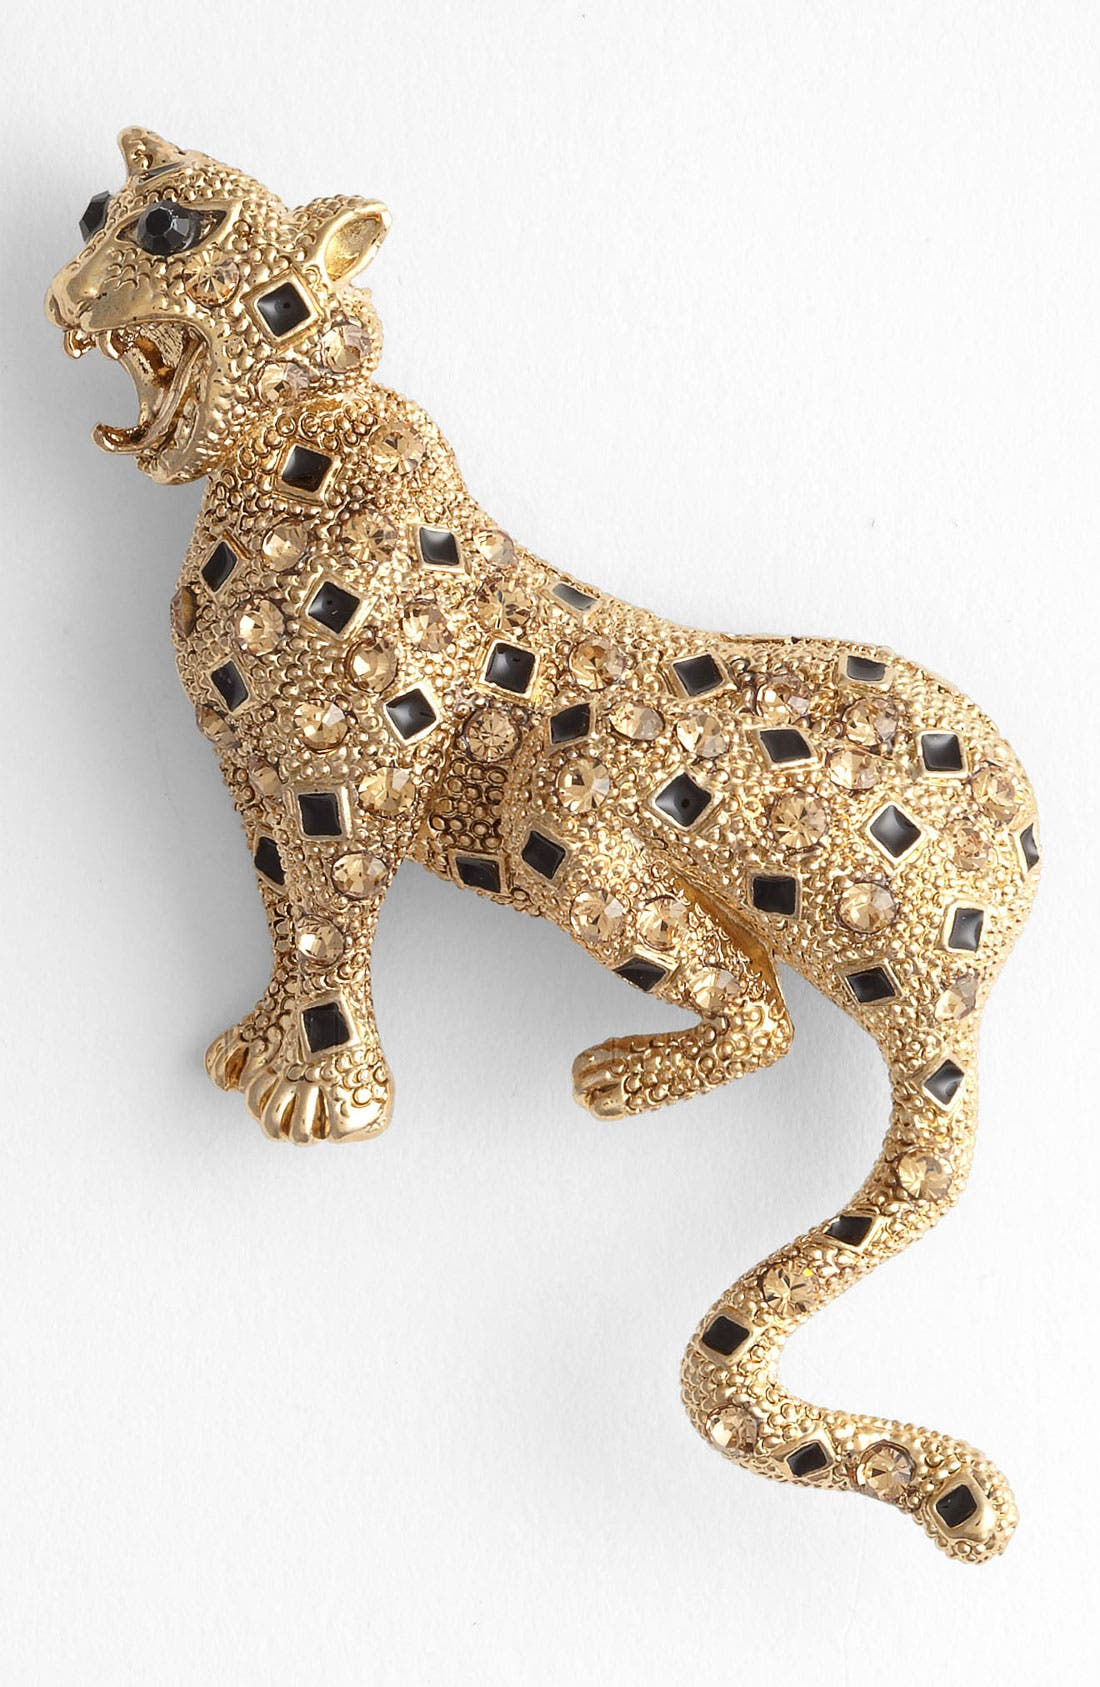 Main Image - Tasha 'Critters' Panther Brooch